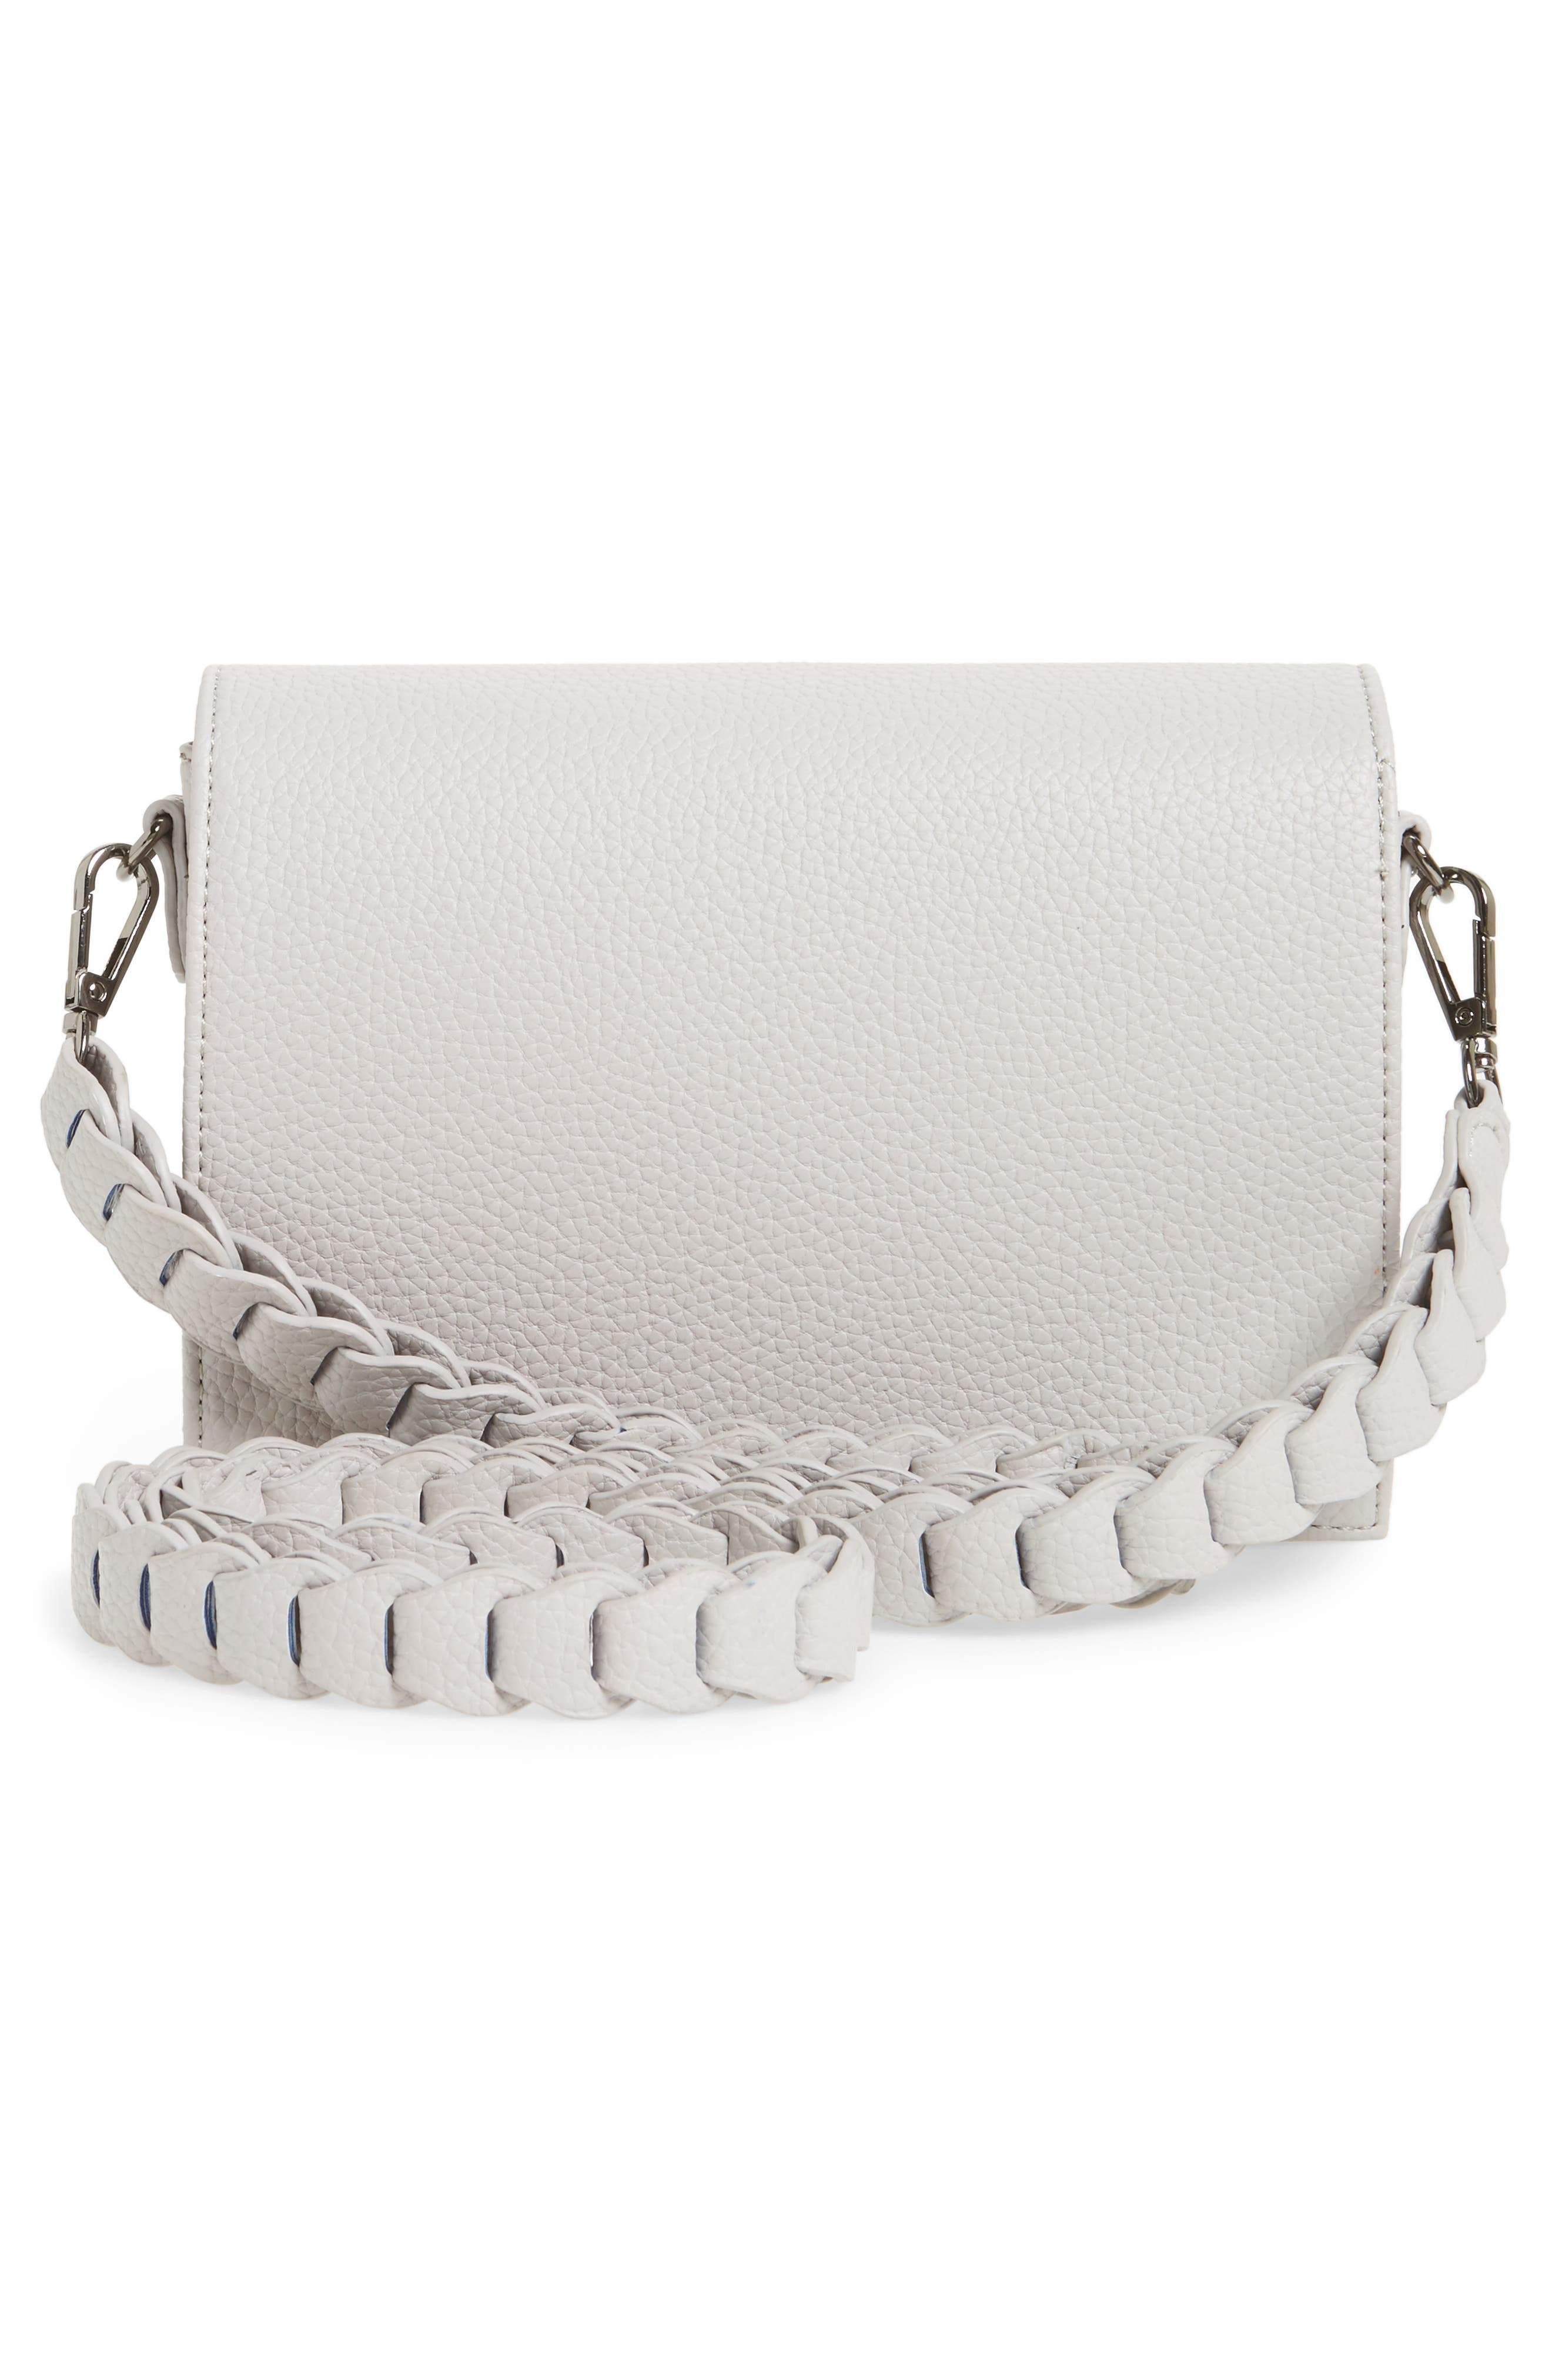 Braided Handle Crossbody Bag,                             Alternate thumbnail 3, color,                             020